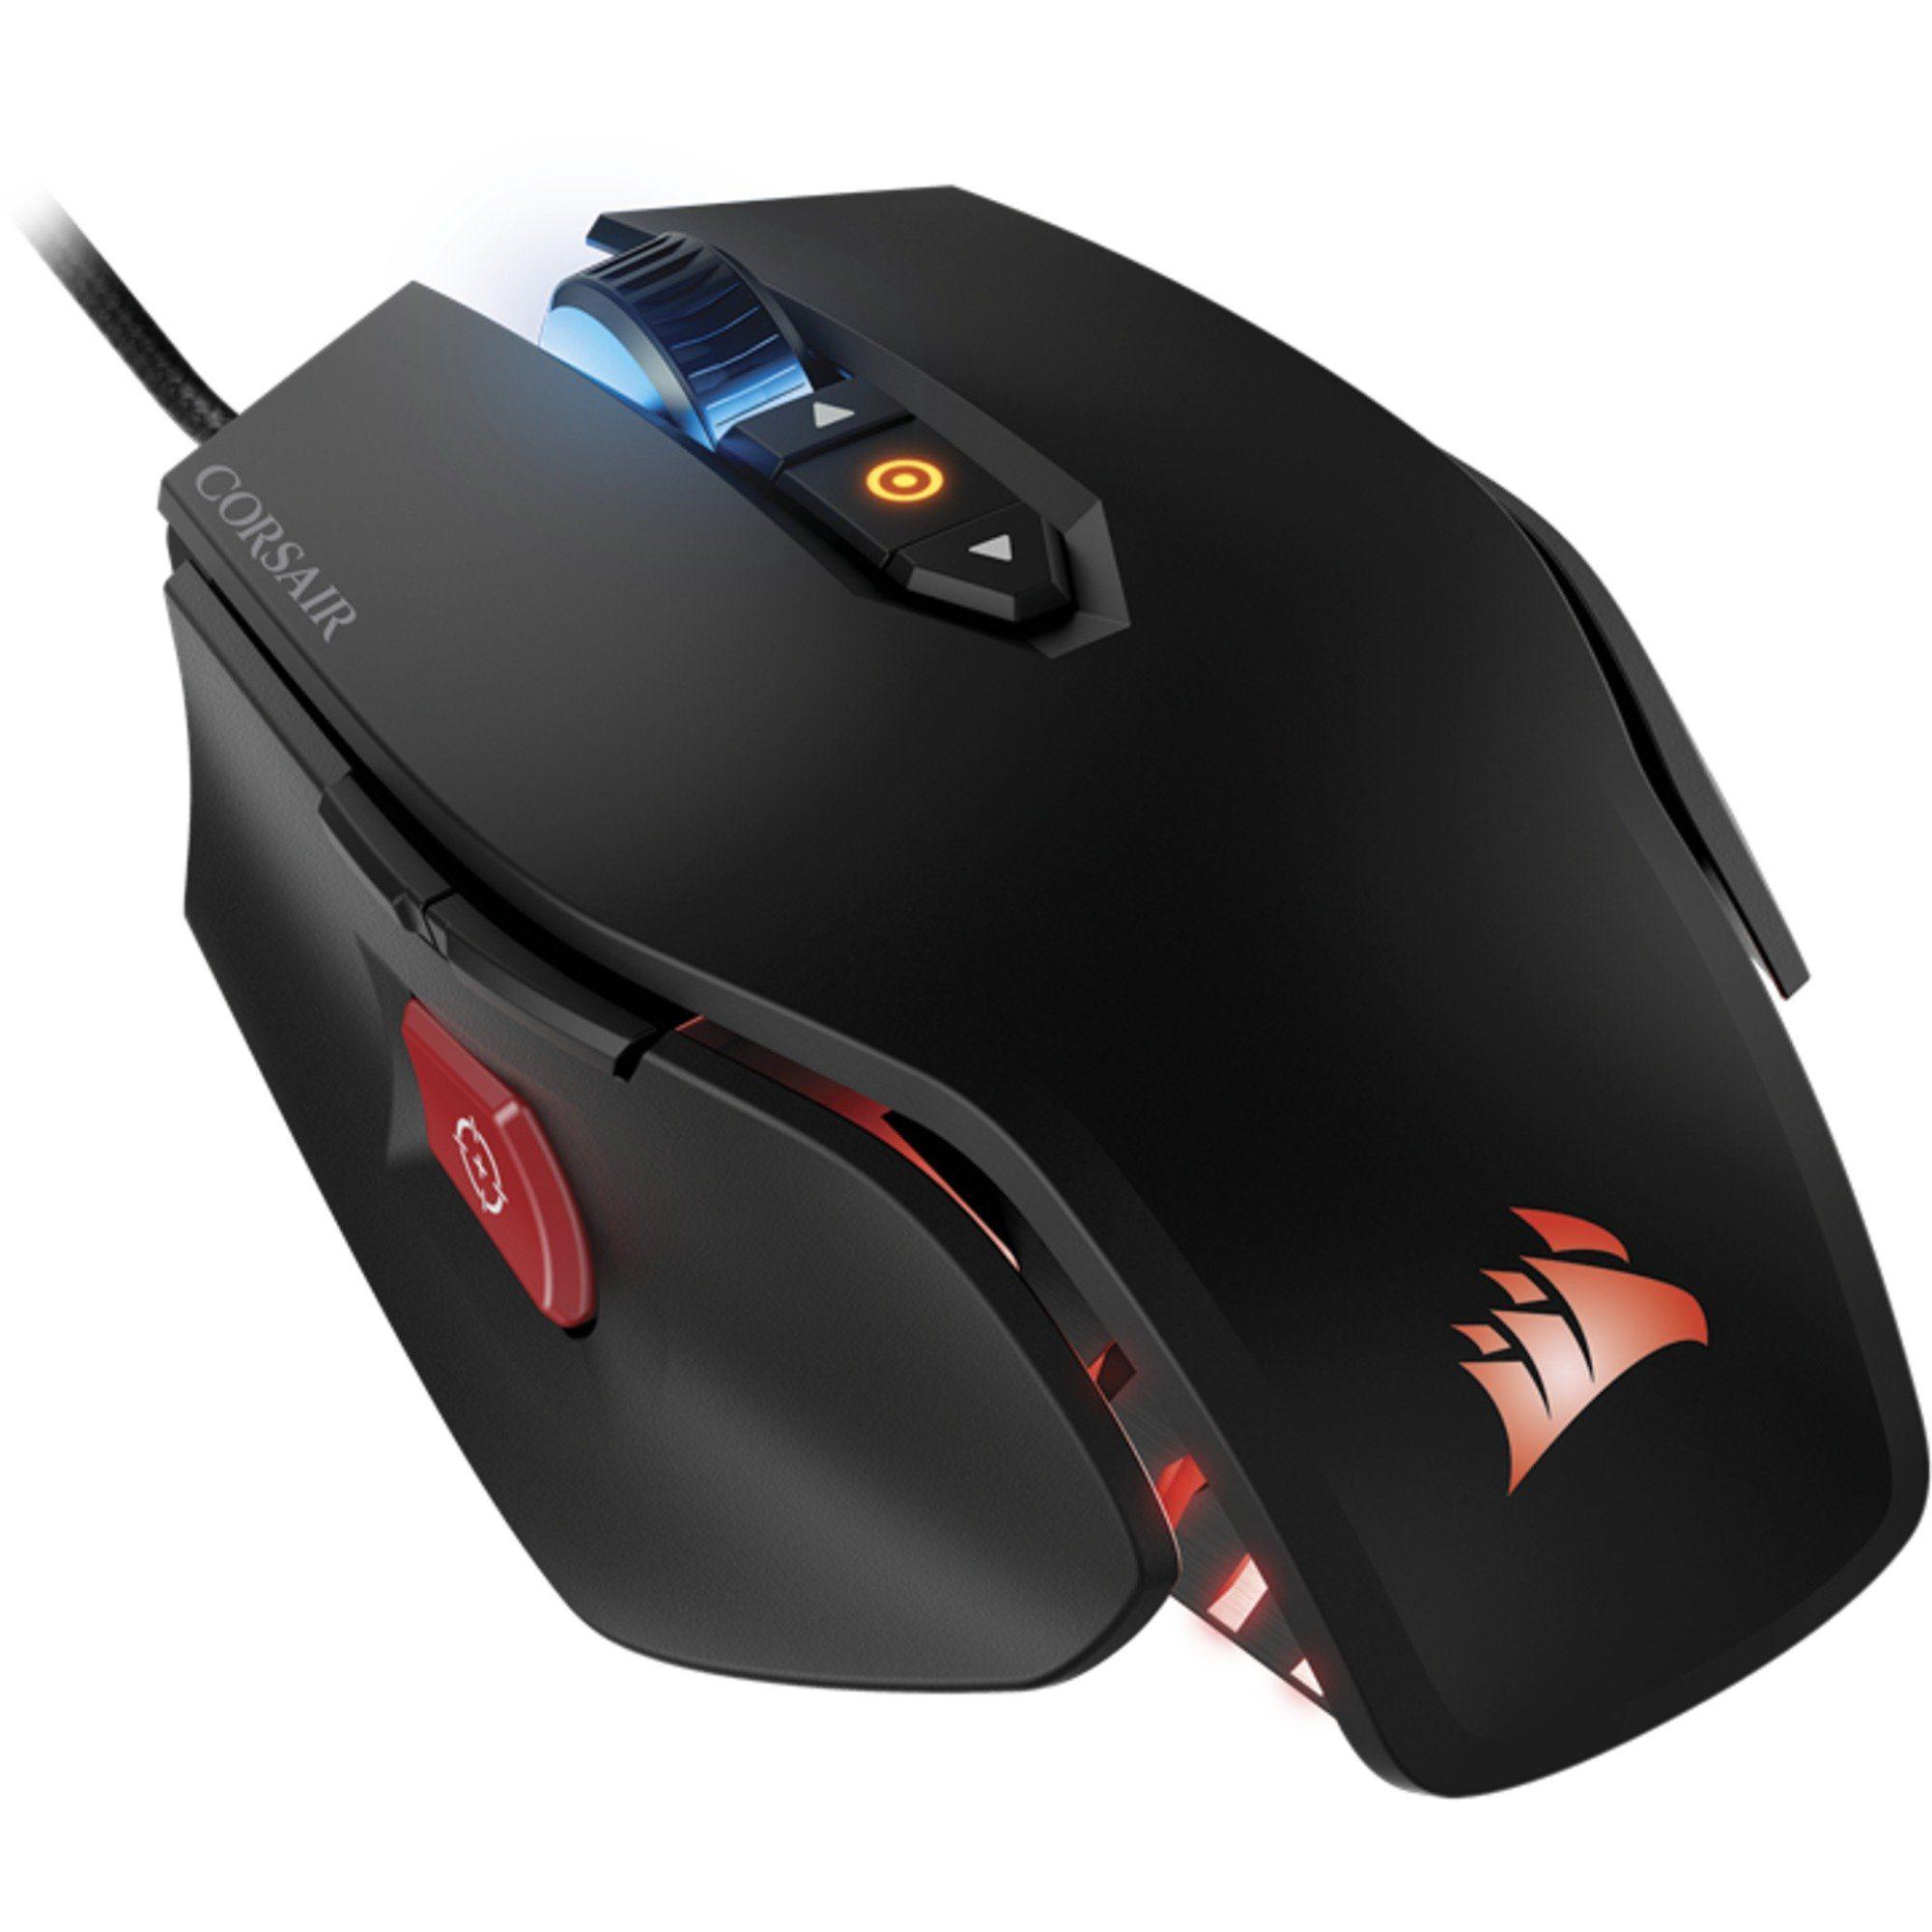 Corsair Maus »Gaming M65 PRO RGB«